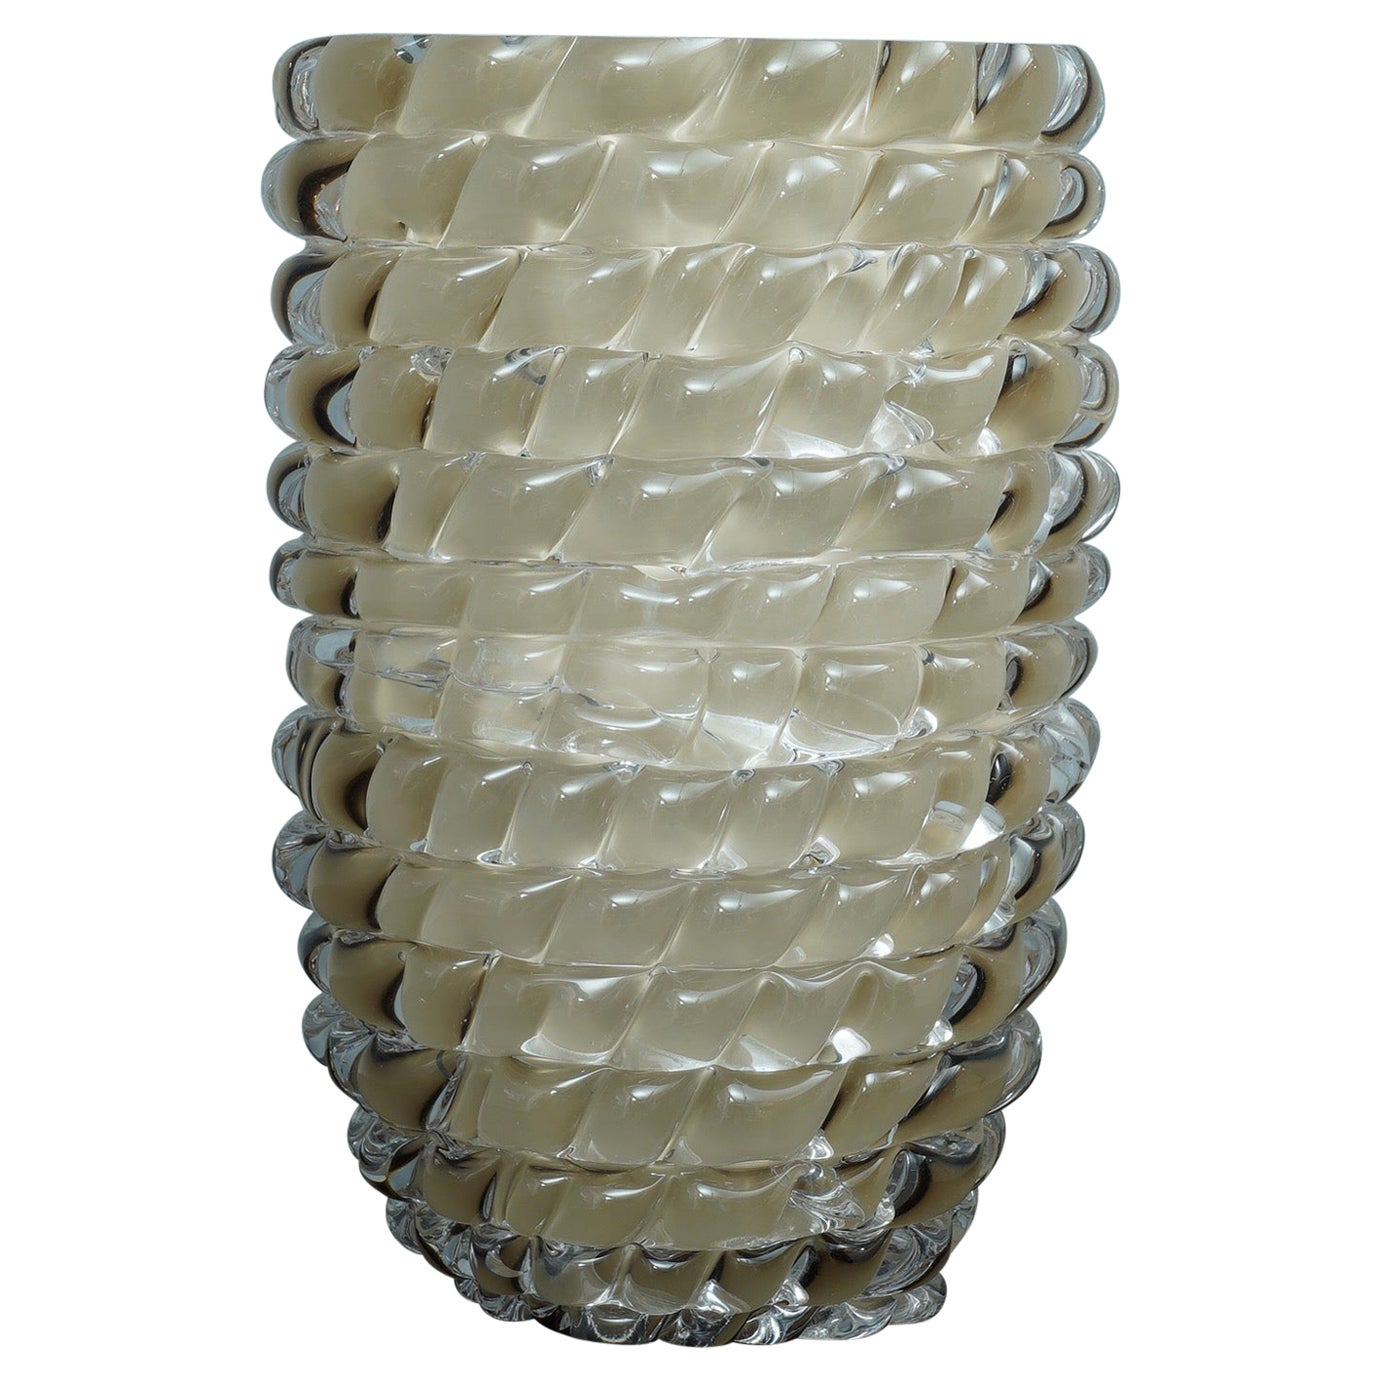 Murano Midcentury Round Dove Gray Color Italian Vase, 1970